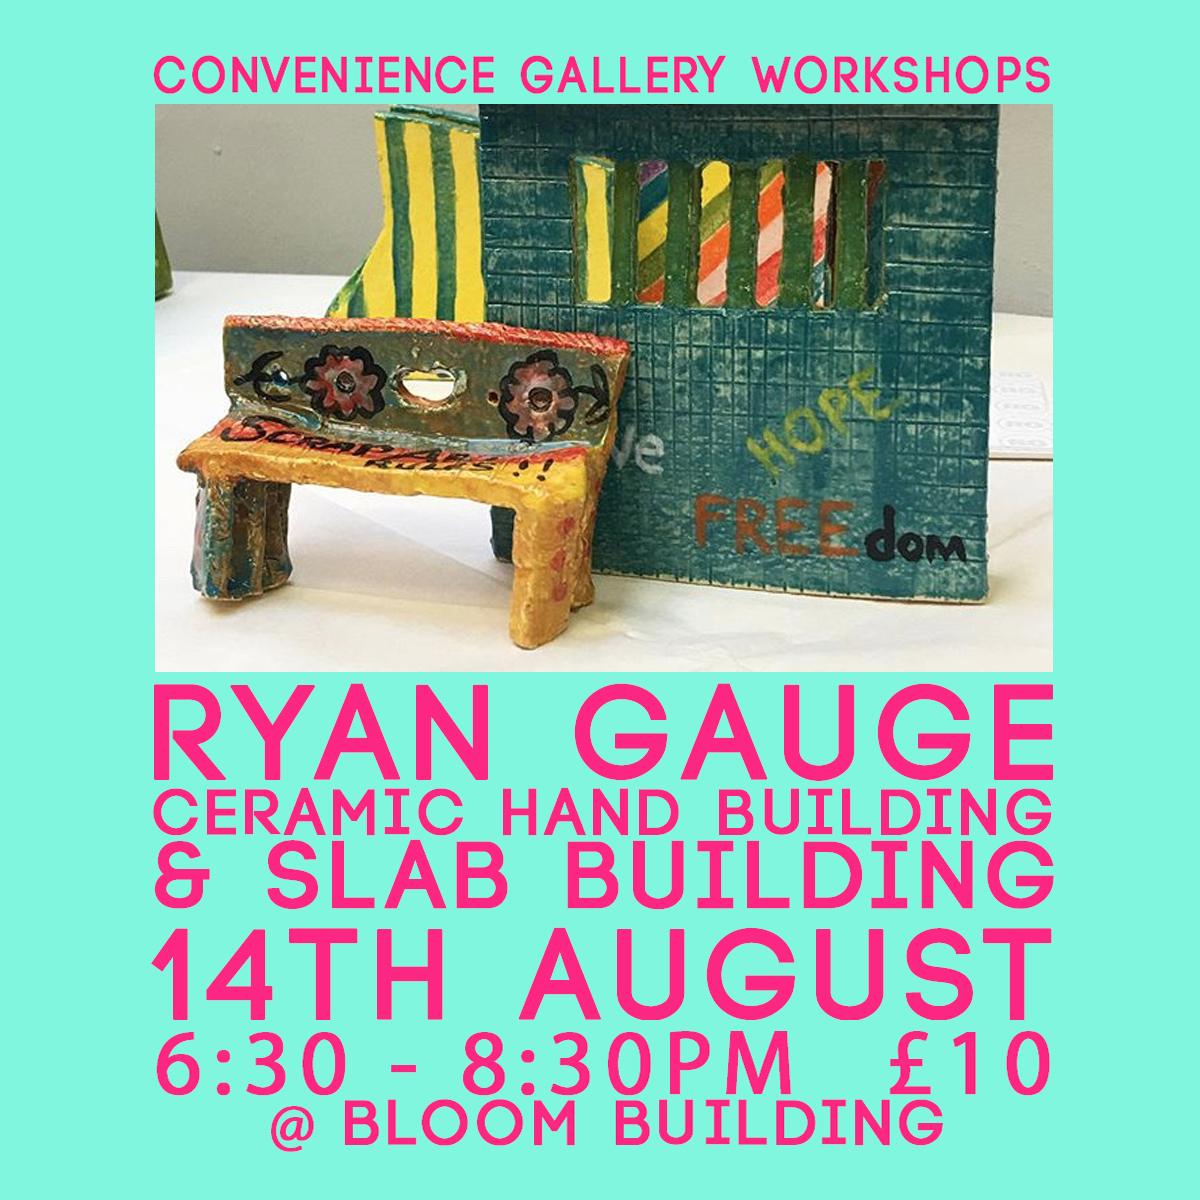 Bloom Building: Simple ceramic hand building techniques (slab building) w. Ryan Gauge